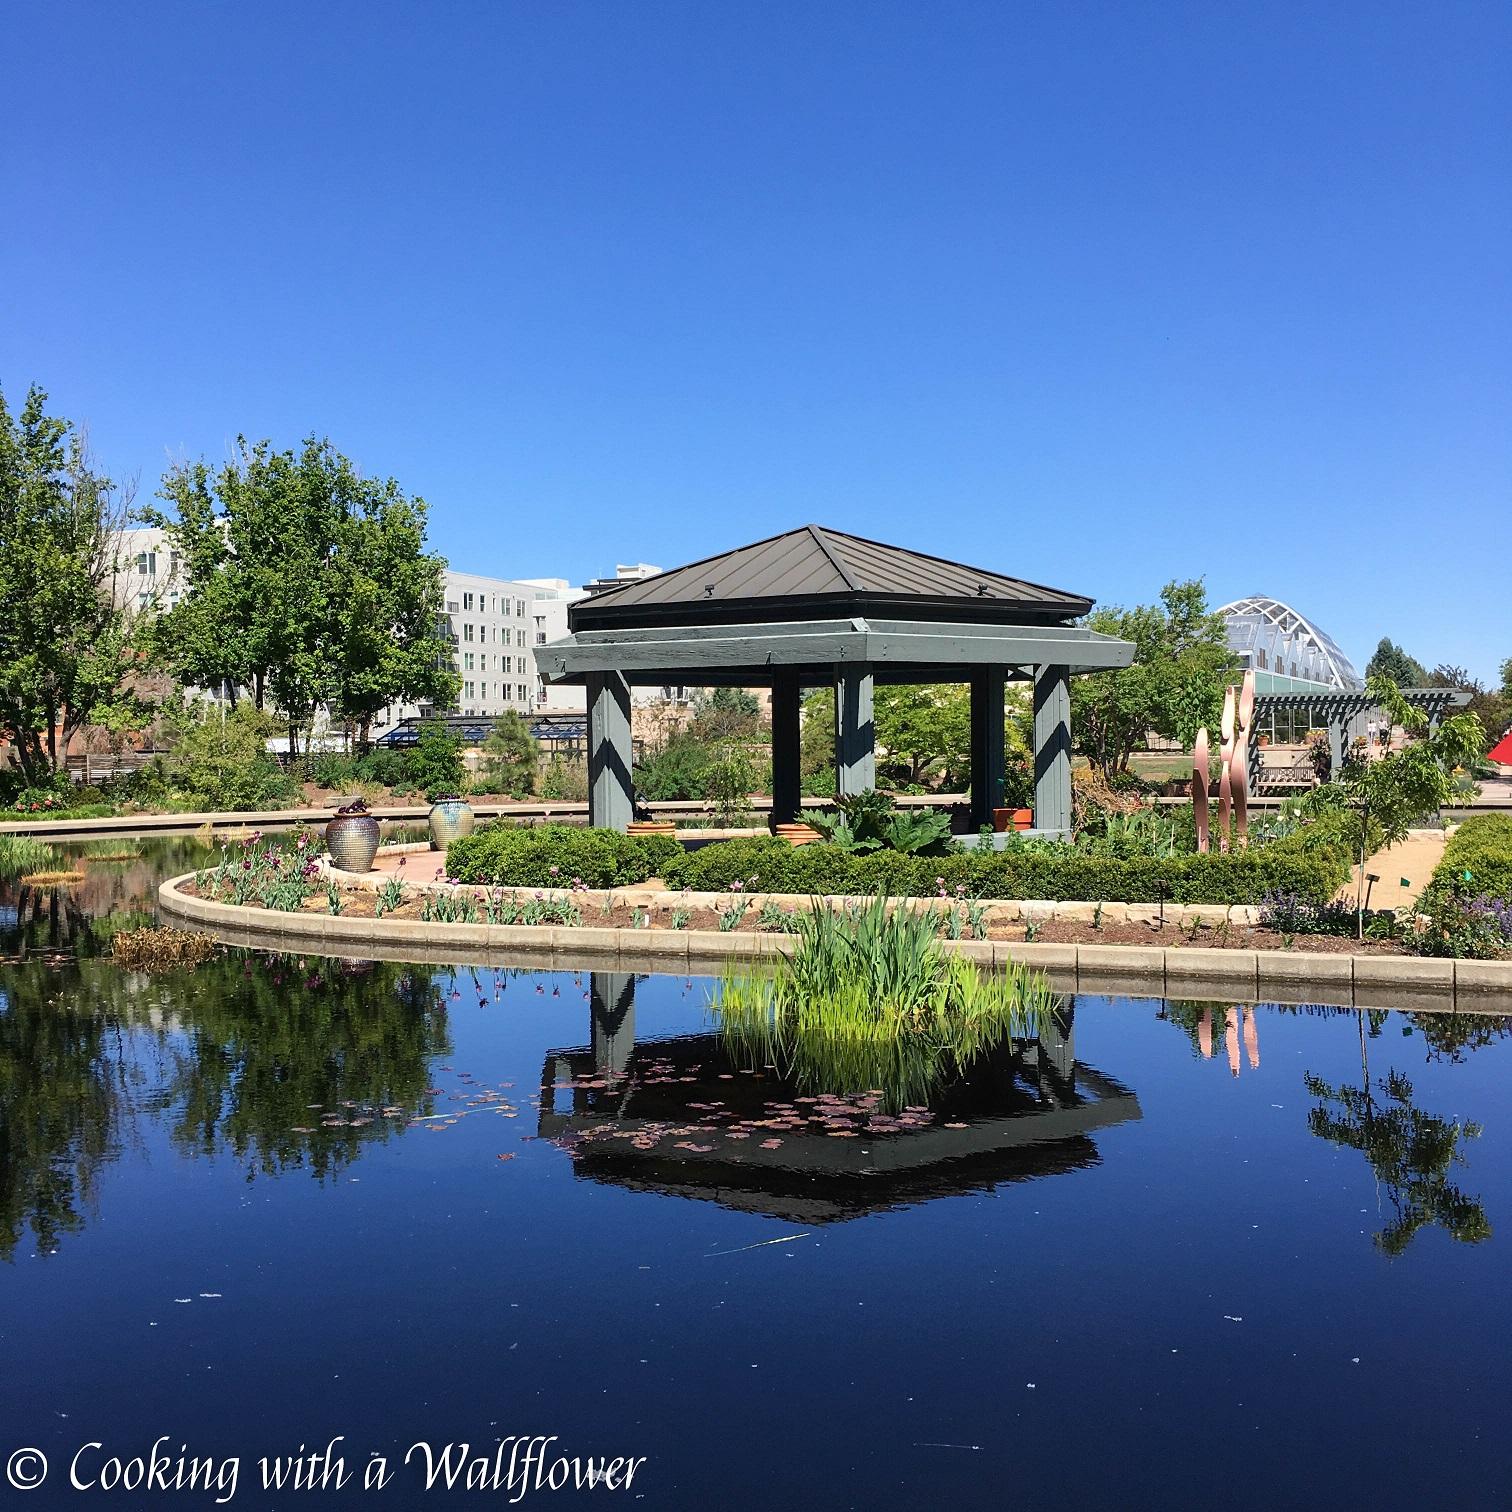 Destination: Discovering Colorado – Day 3